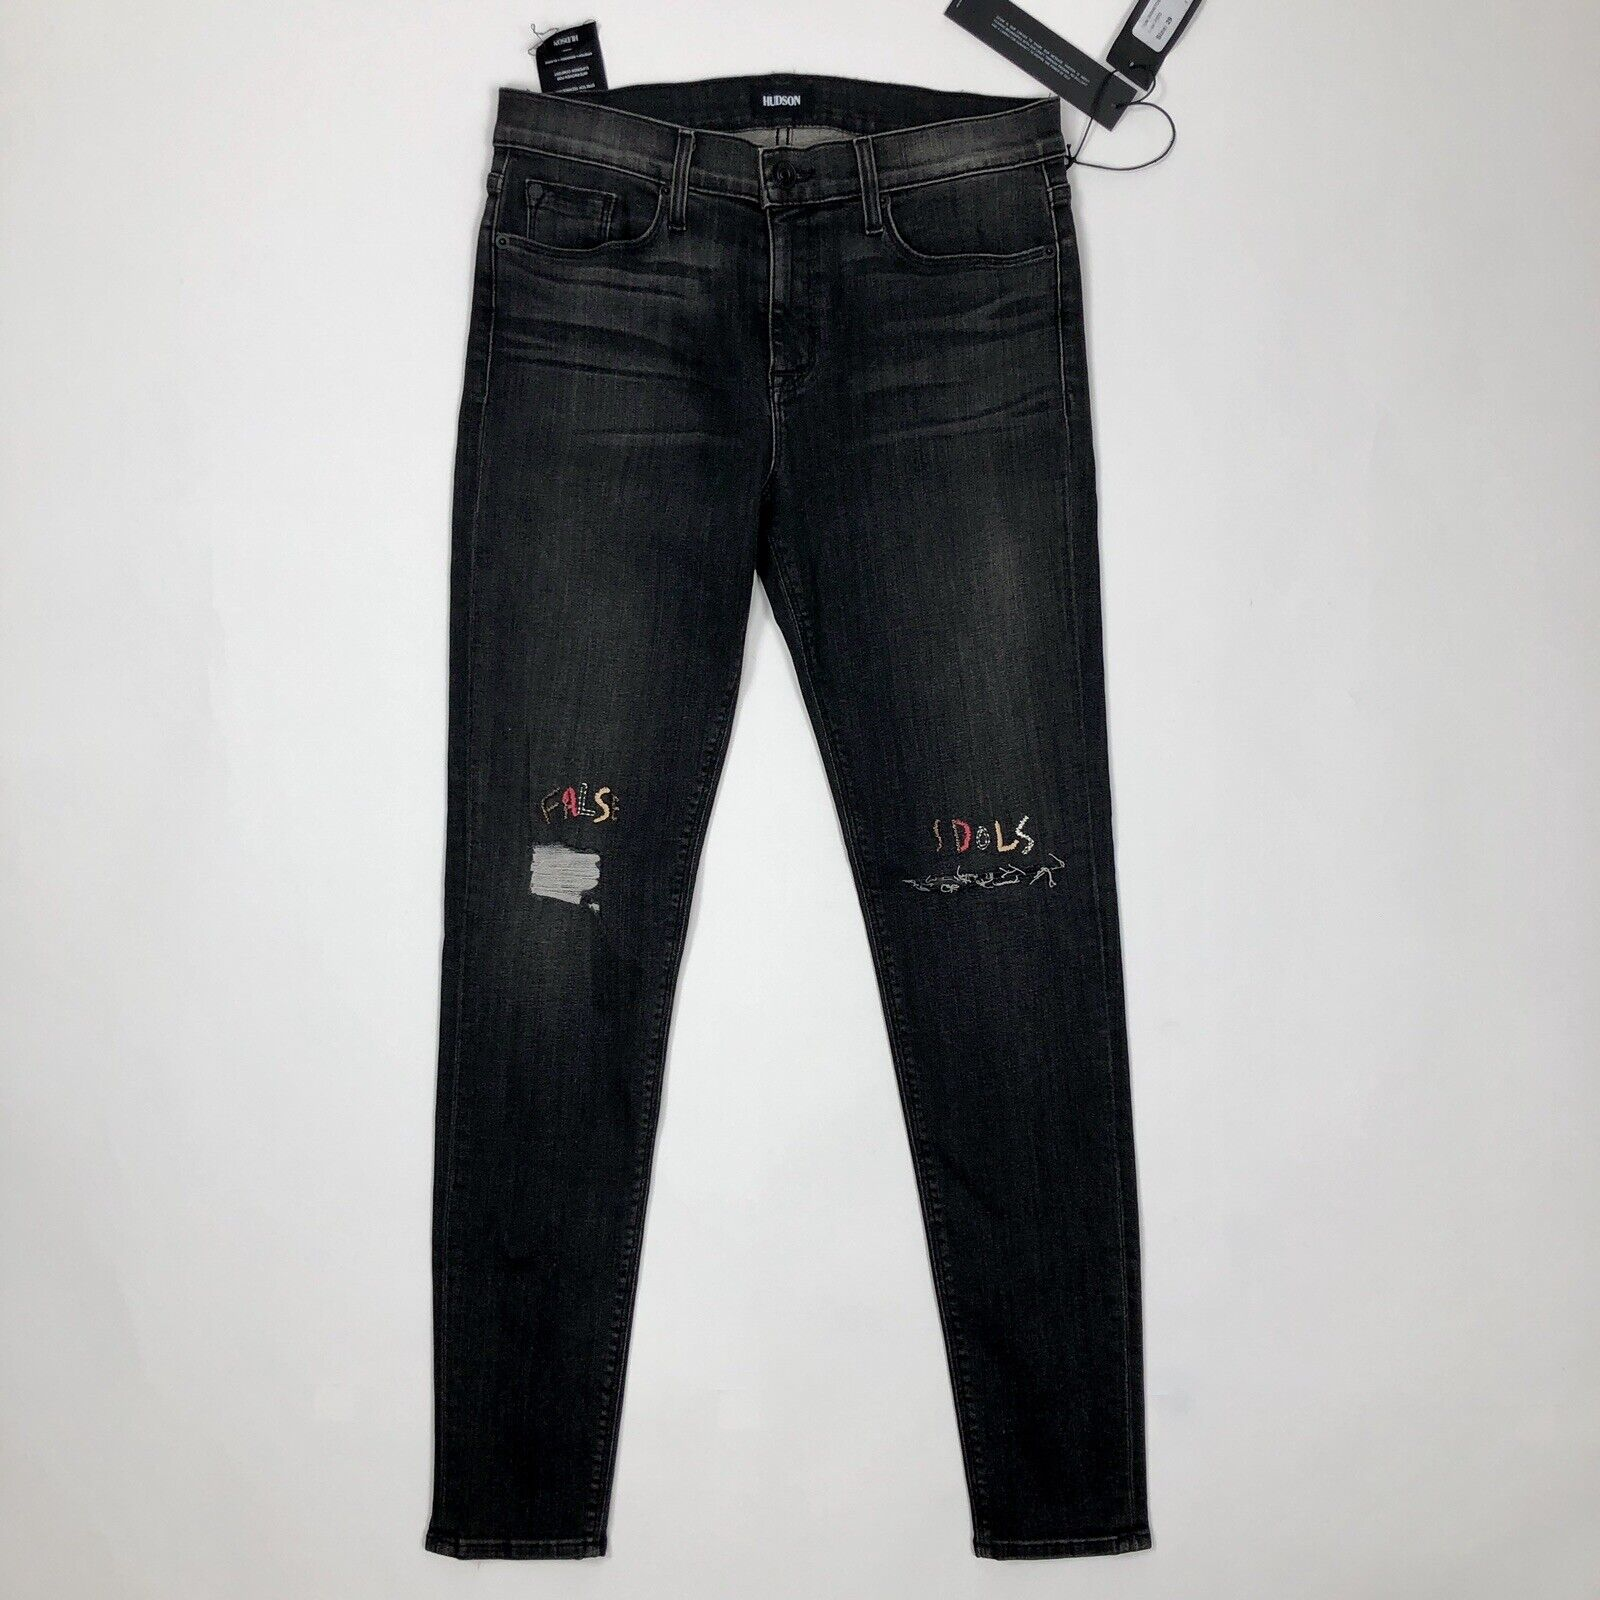 Hudson Womens Size 29  Nico  Midrise Super Skinny Reverie Denim Distressed Jeans